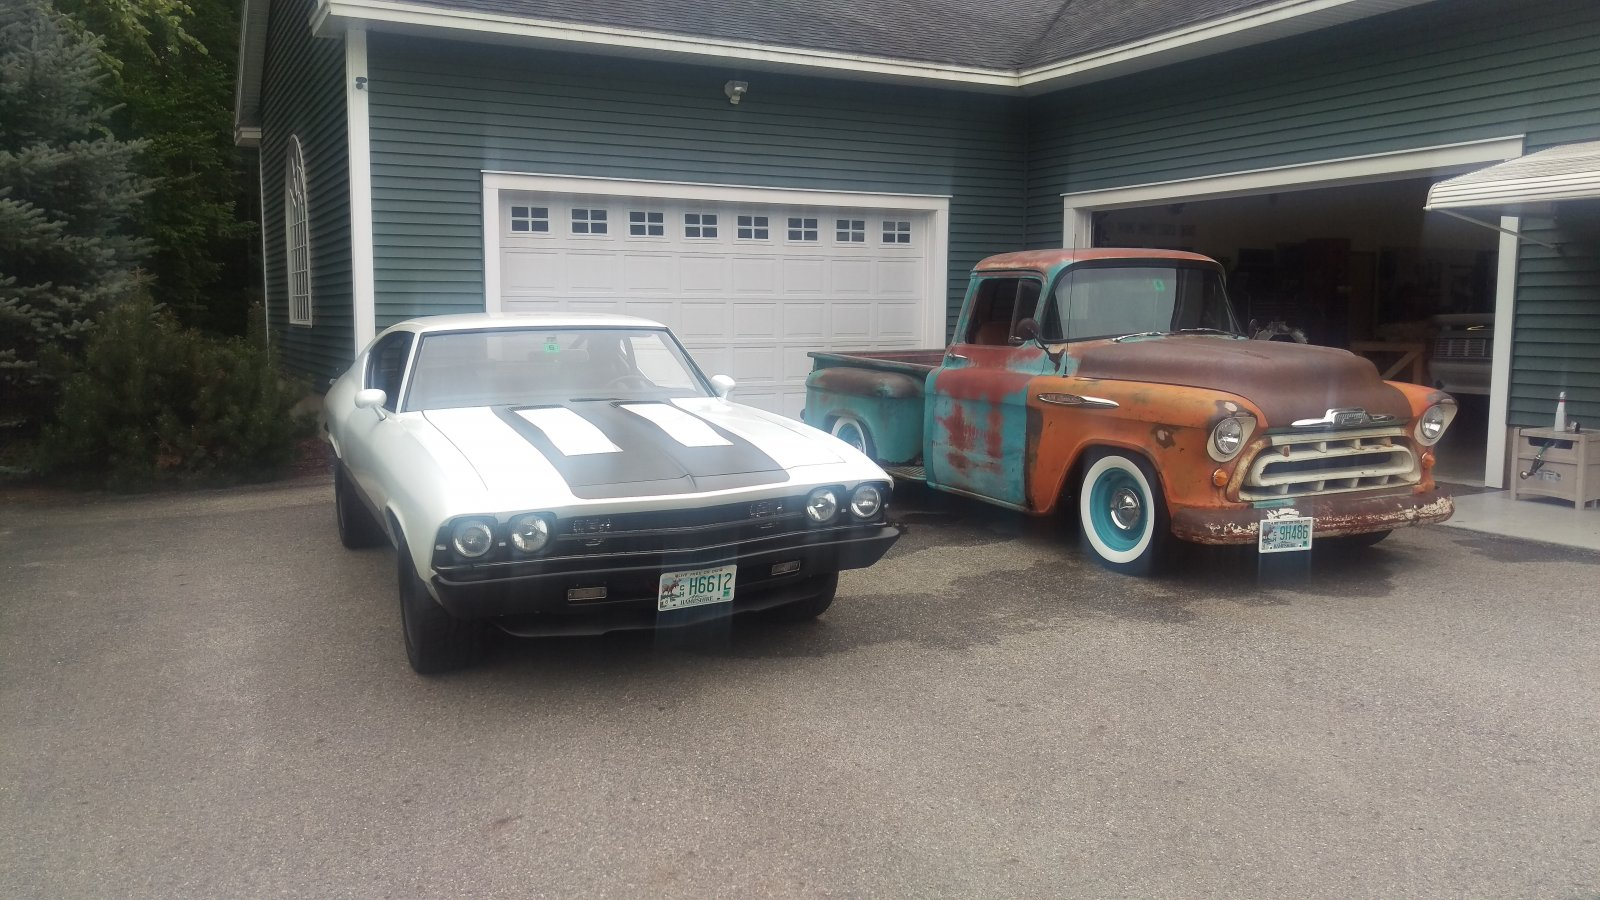 East Coast Cobras, LLC   Designer and builder of kit cars, street ...